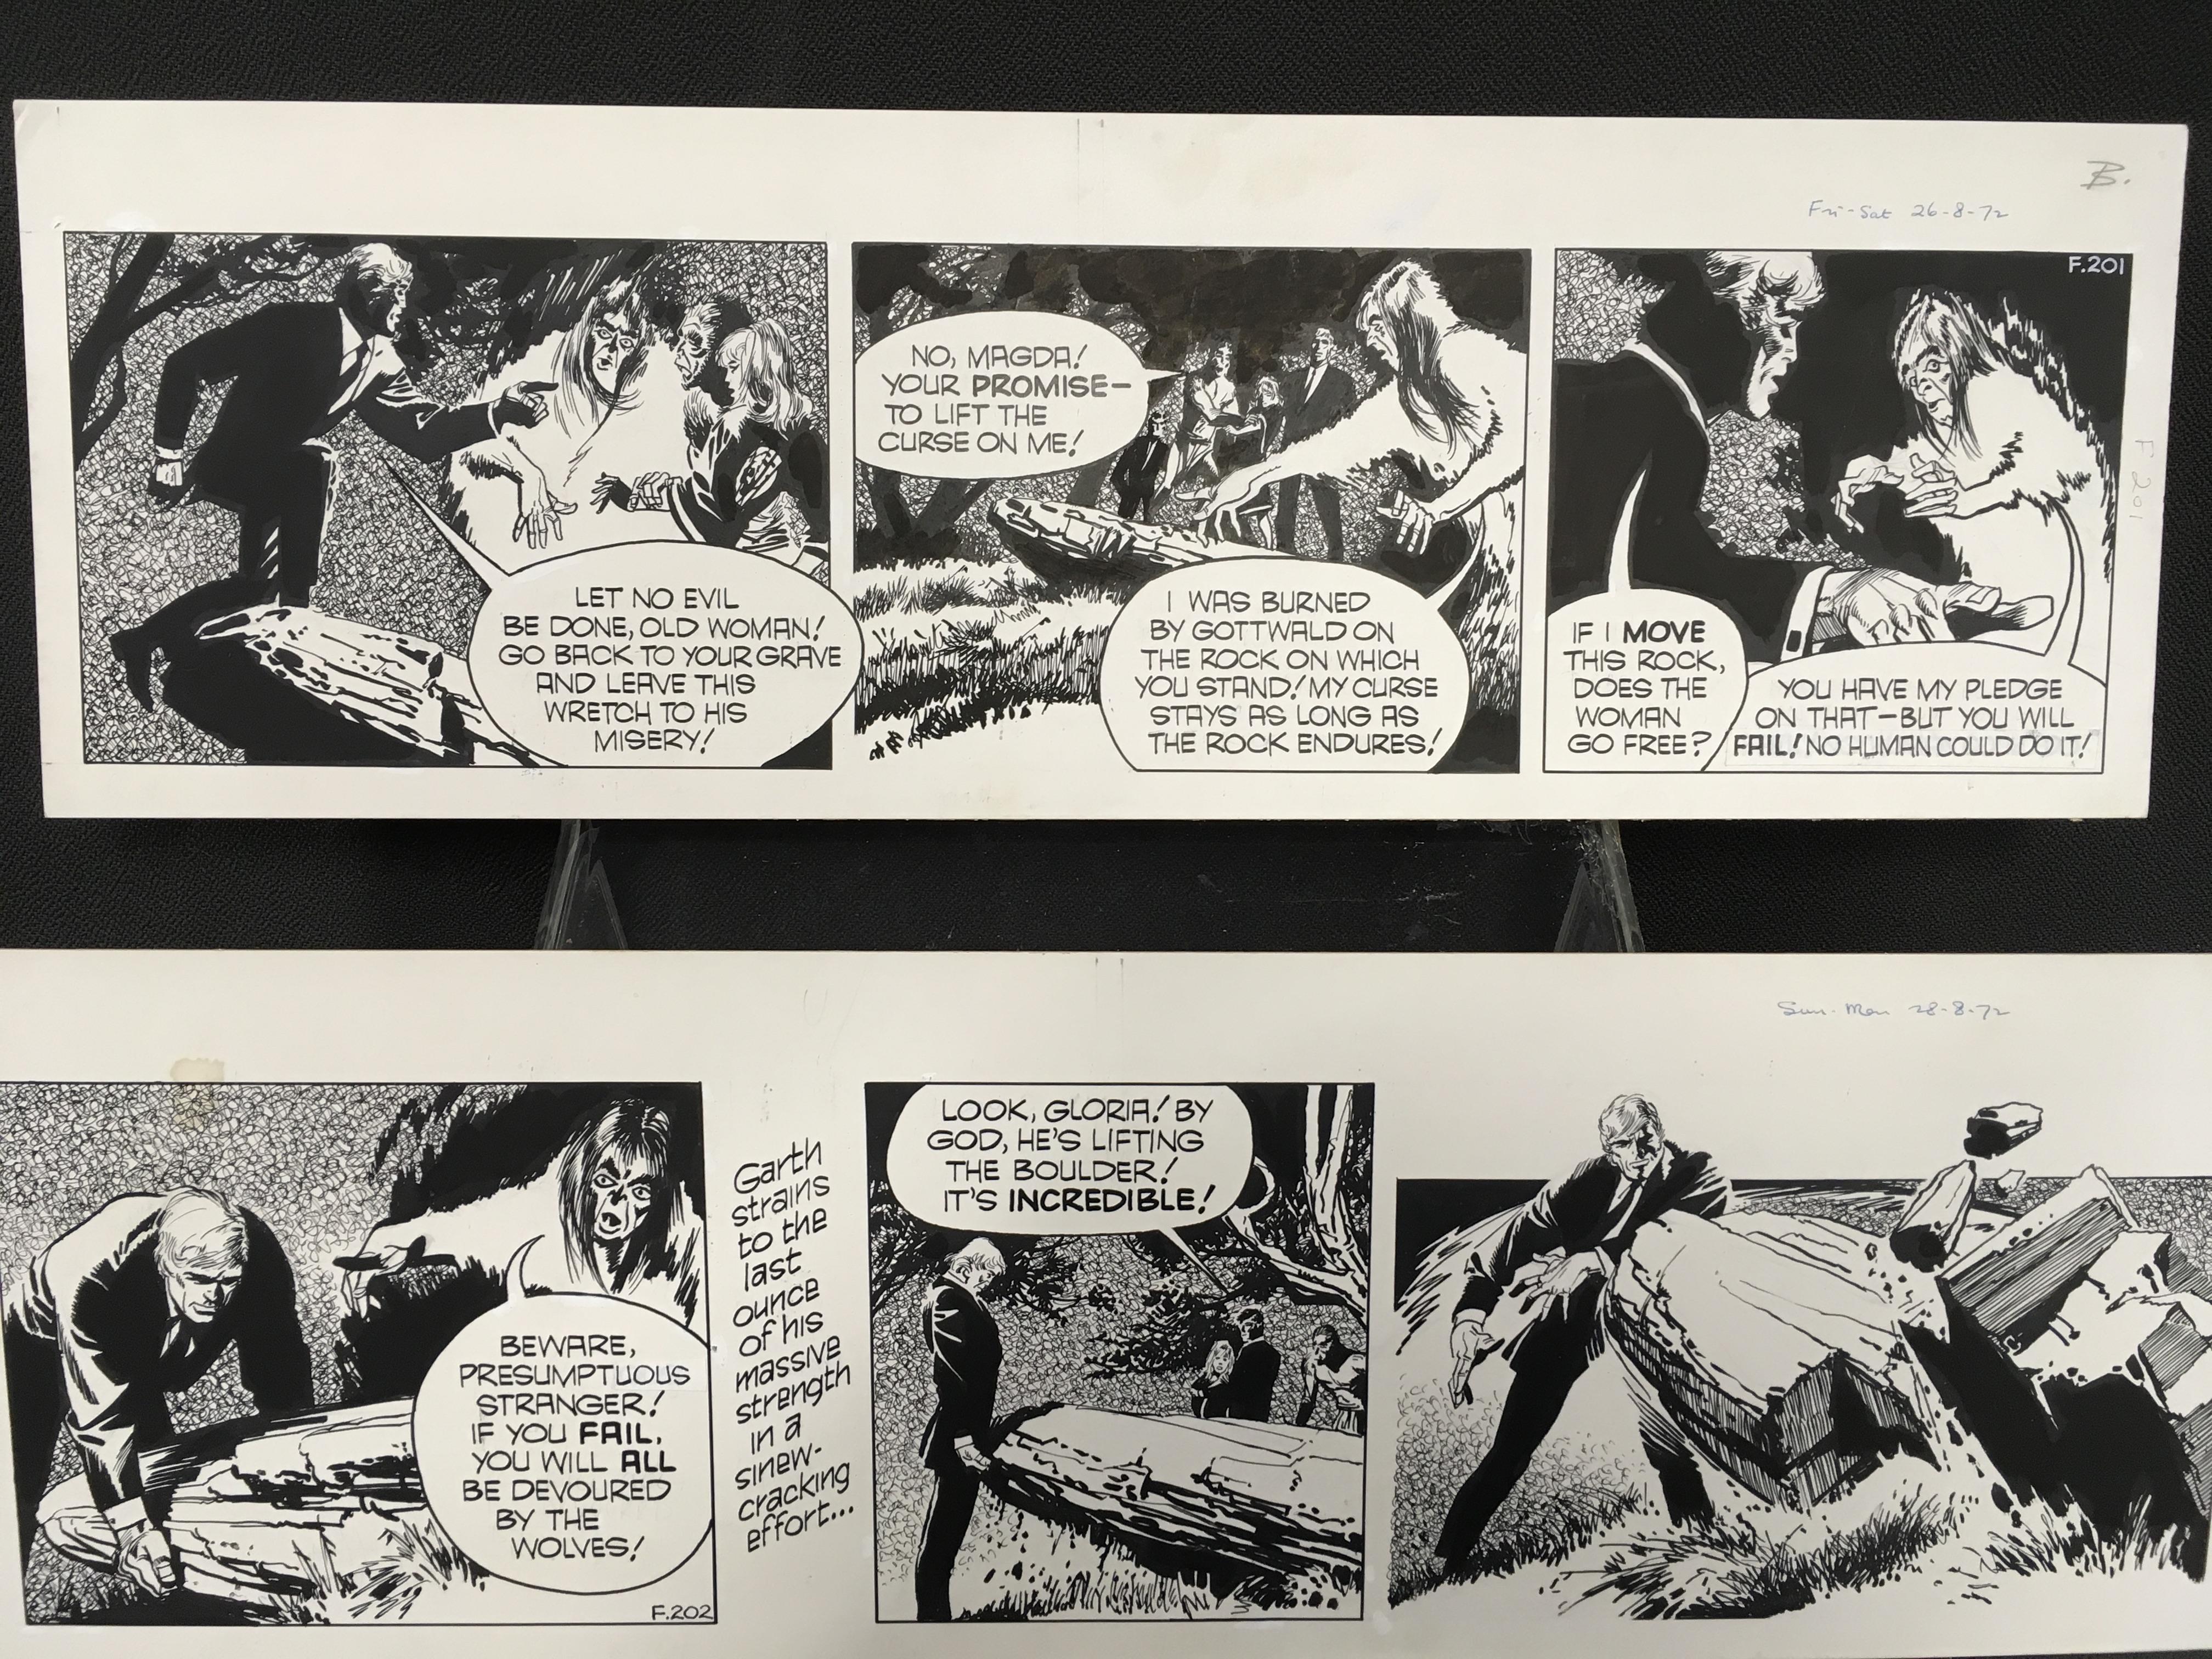 Lot 431 - Original Frank Bellamy Garth artwork, c.1972: two pieces of pen on board artwork by British comic